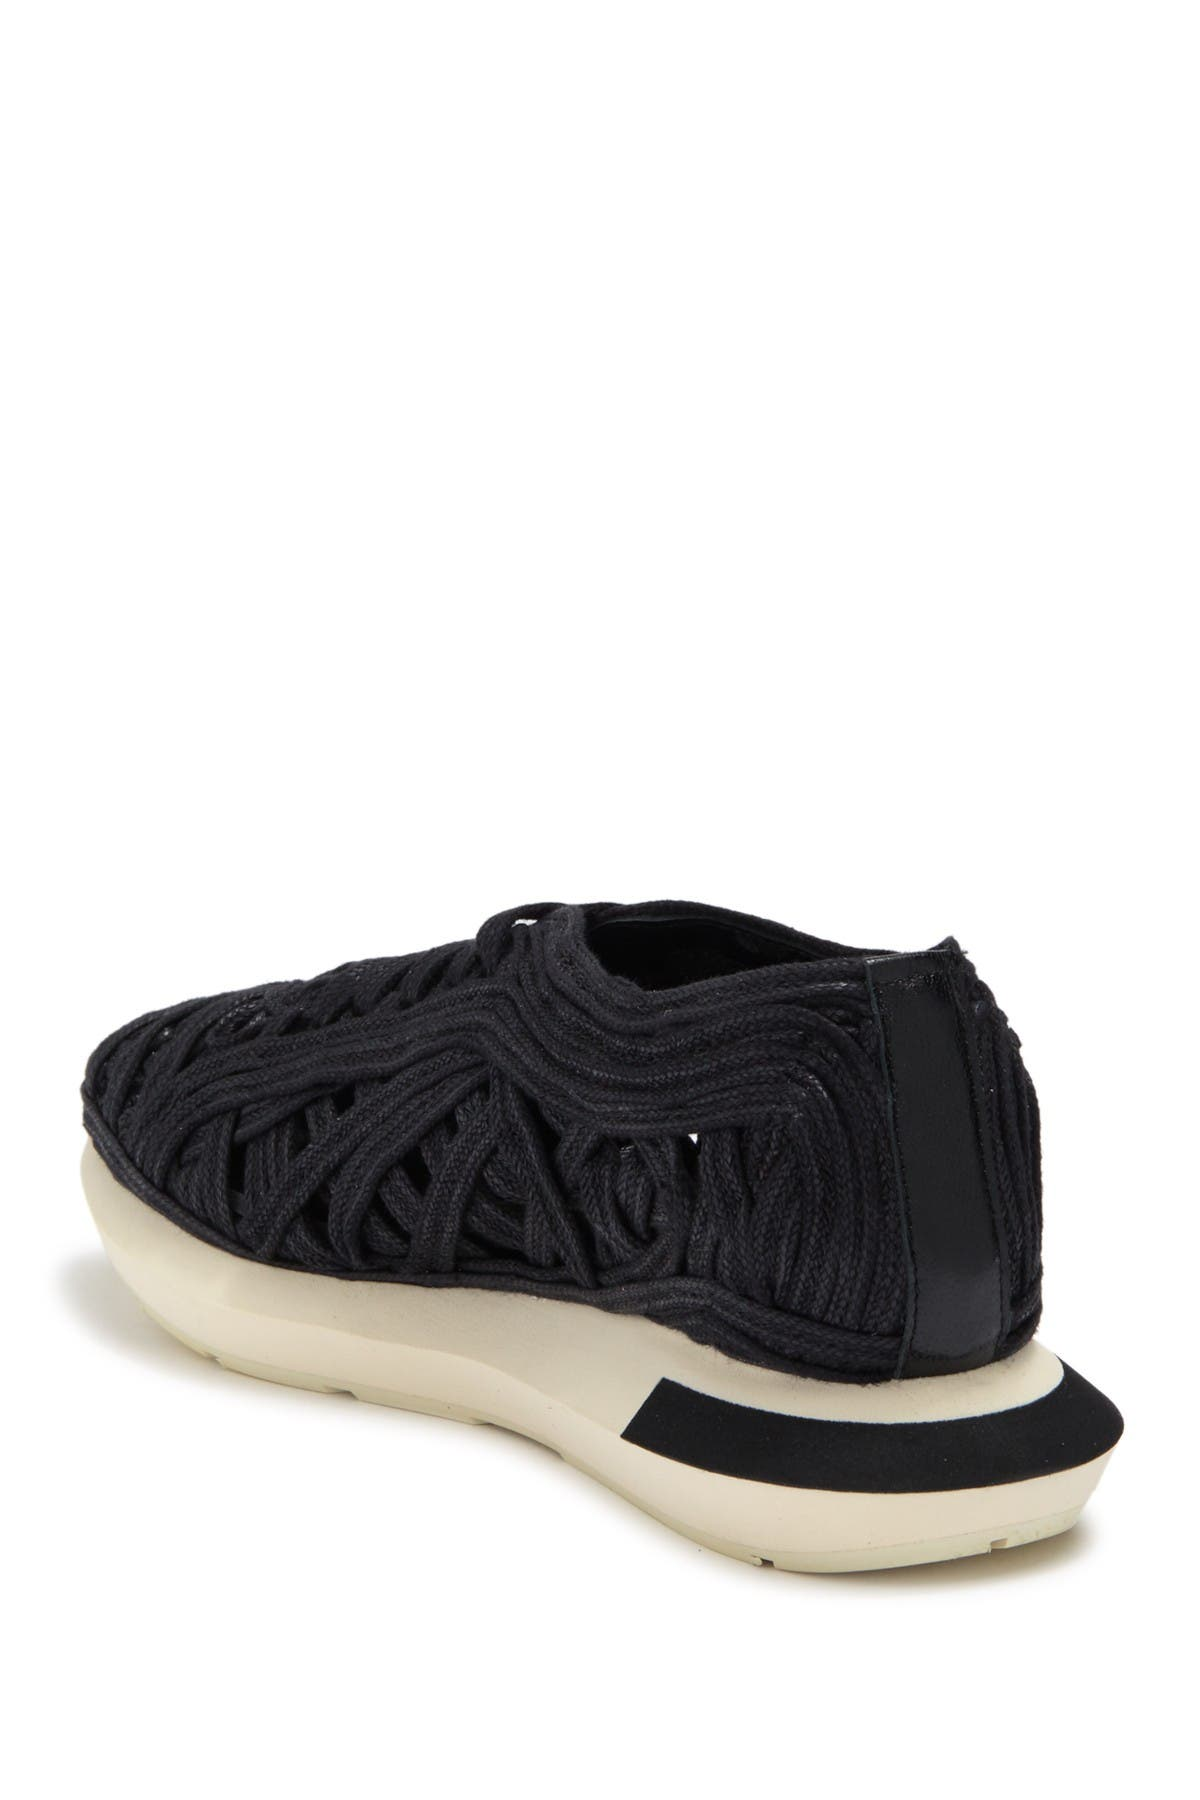 Image of Paloma Barcelo Loby Fashion Sneaker